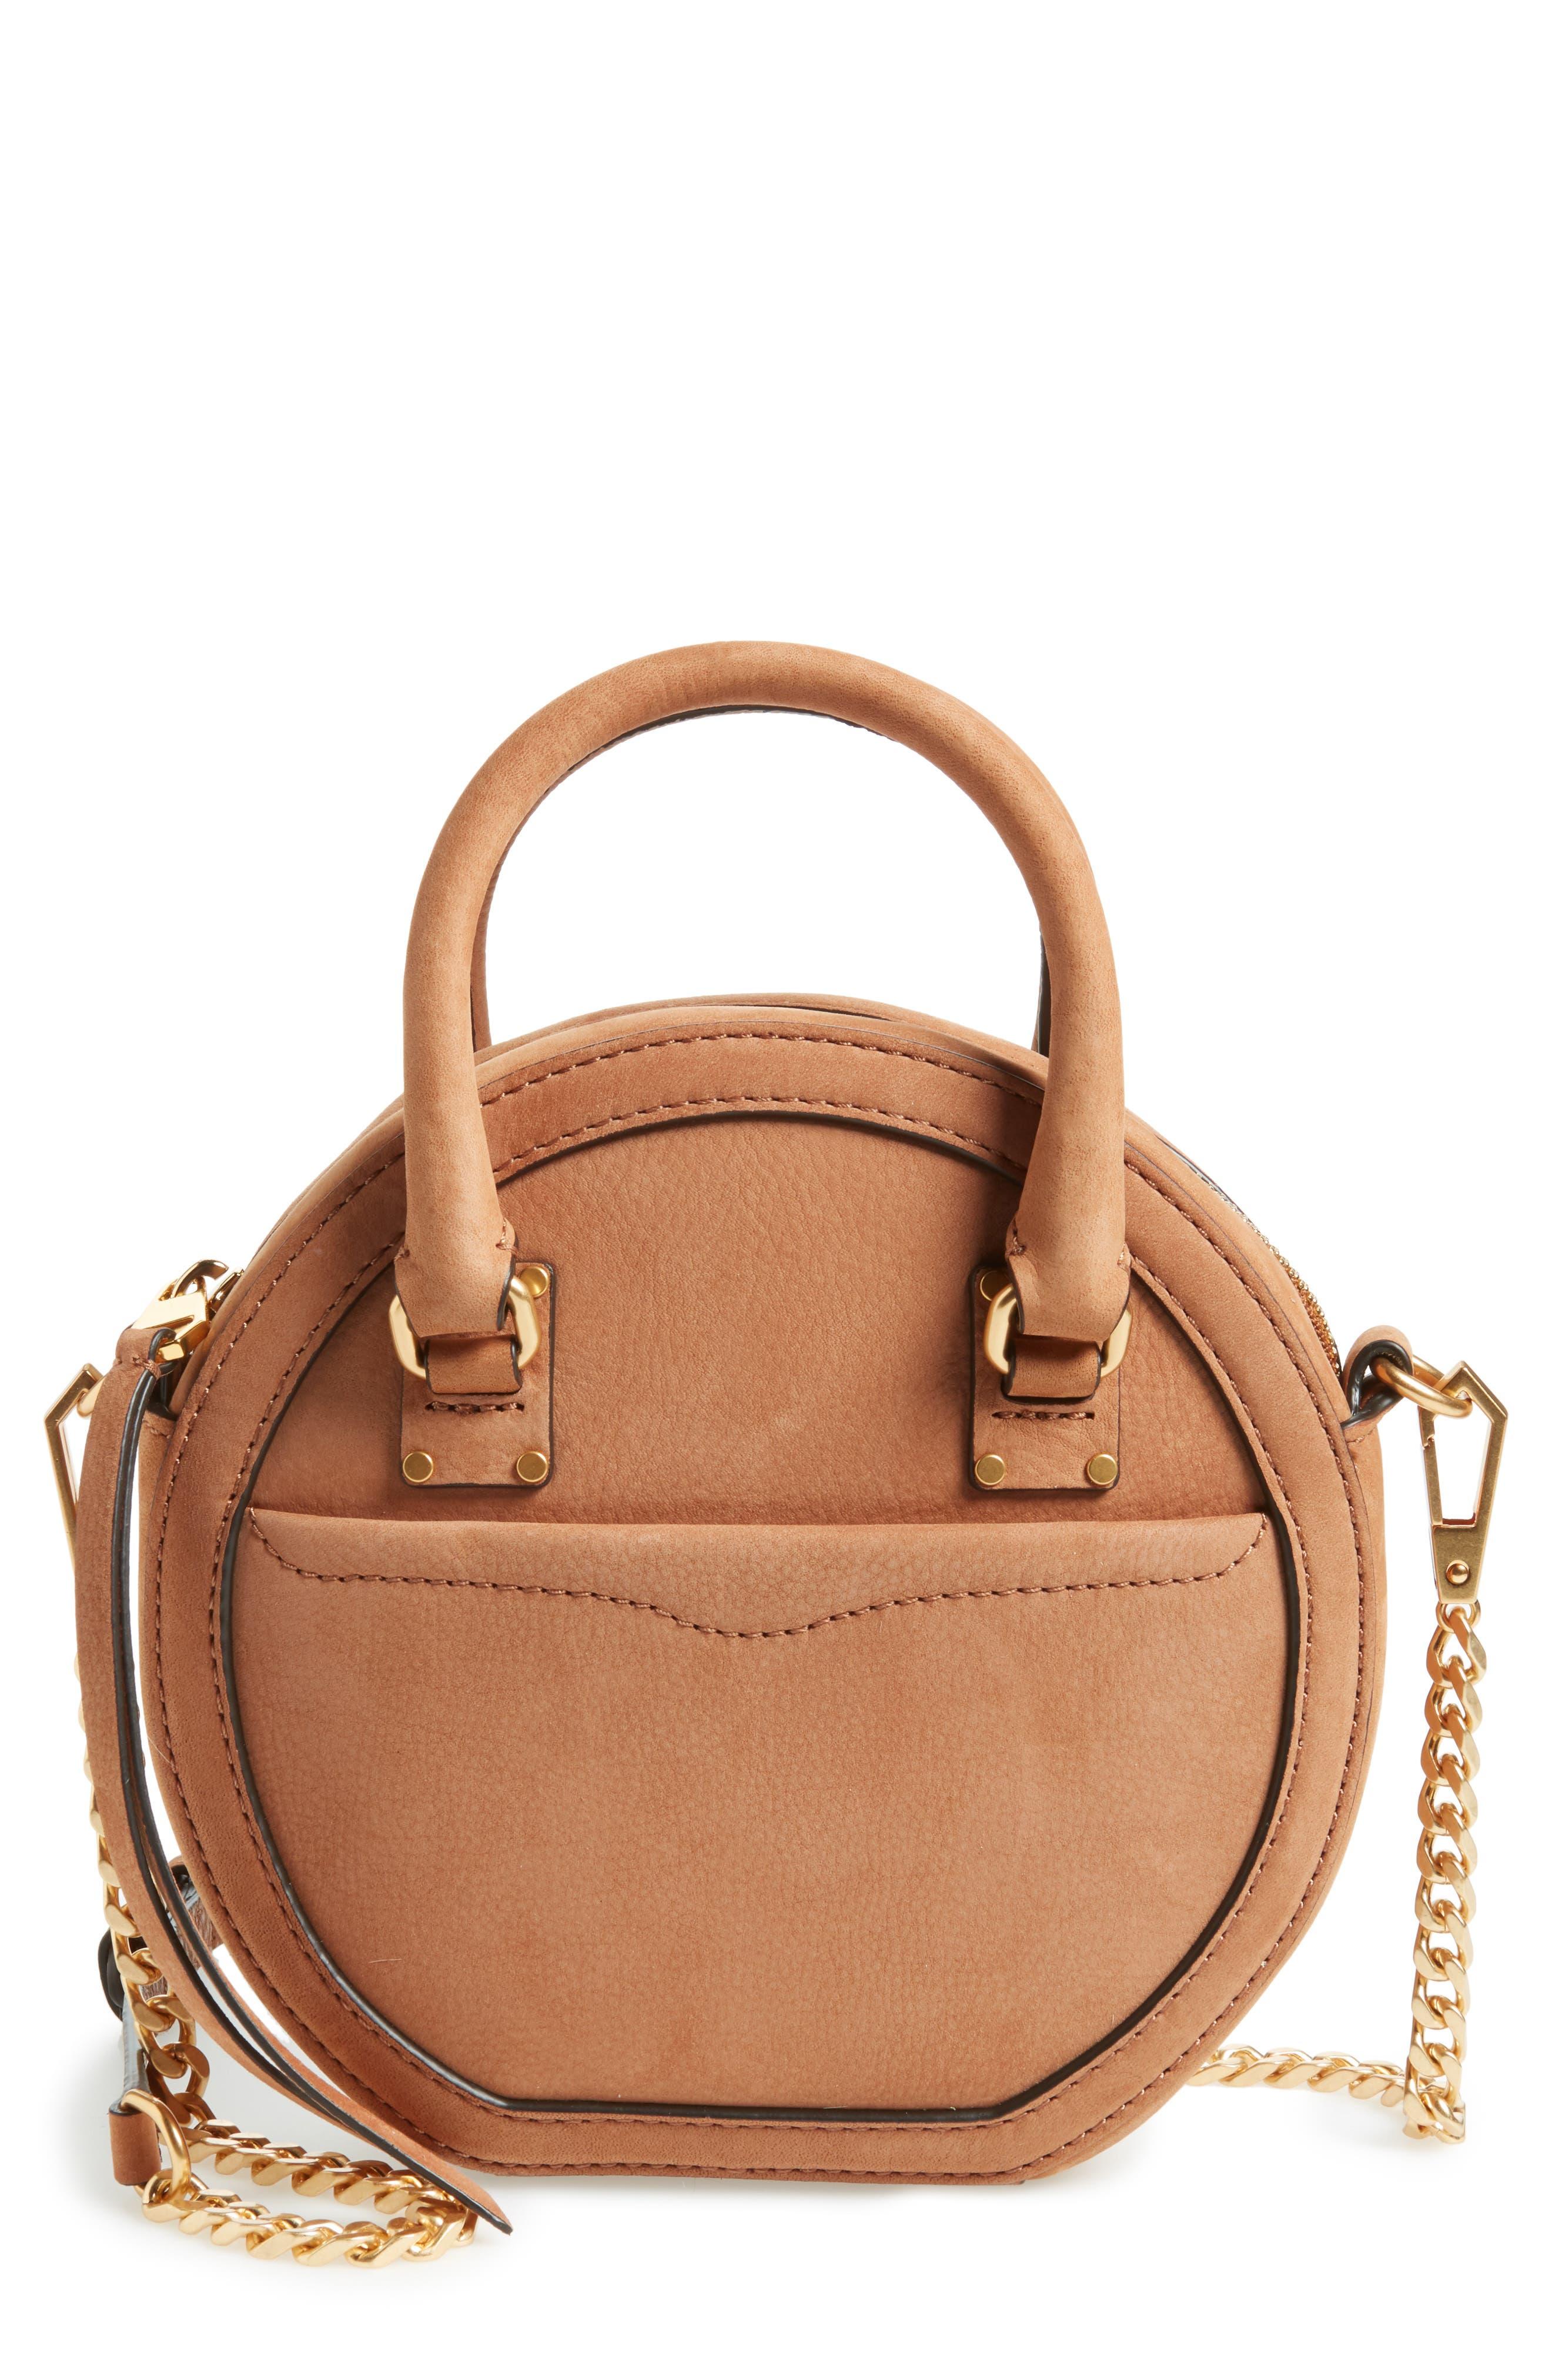 REBECCA MINKOFF Bree Circle Crossbody Bag, Main, color, 230